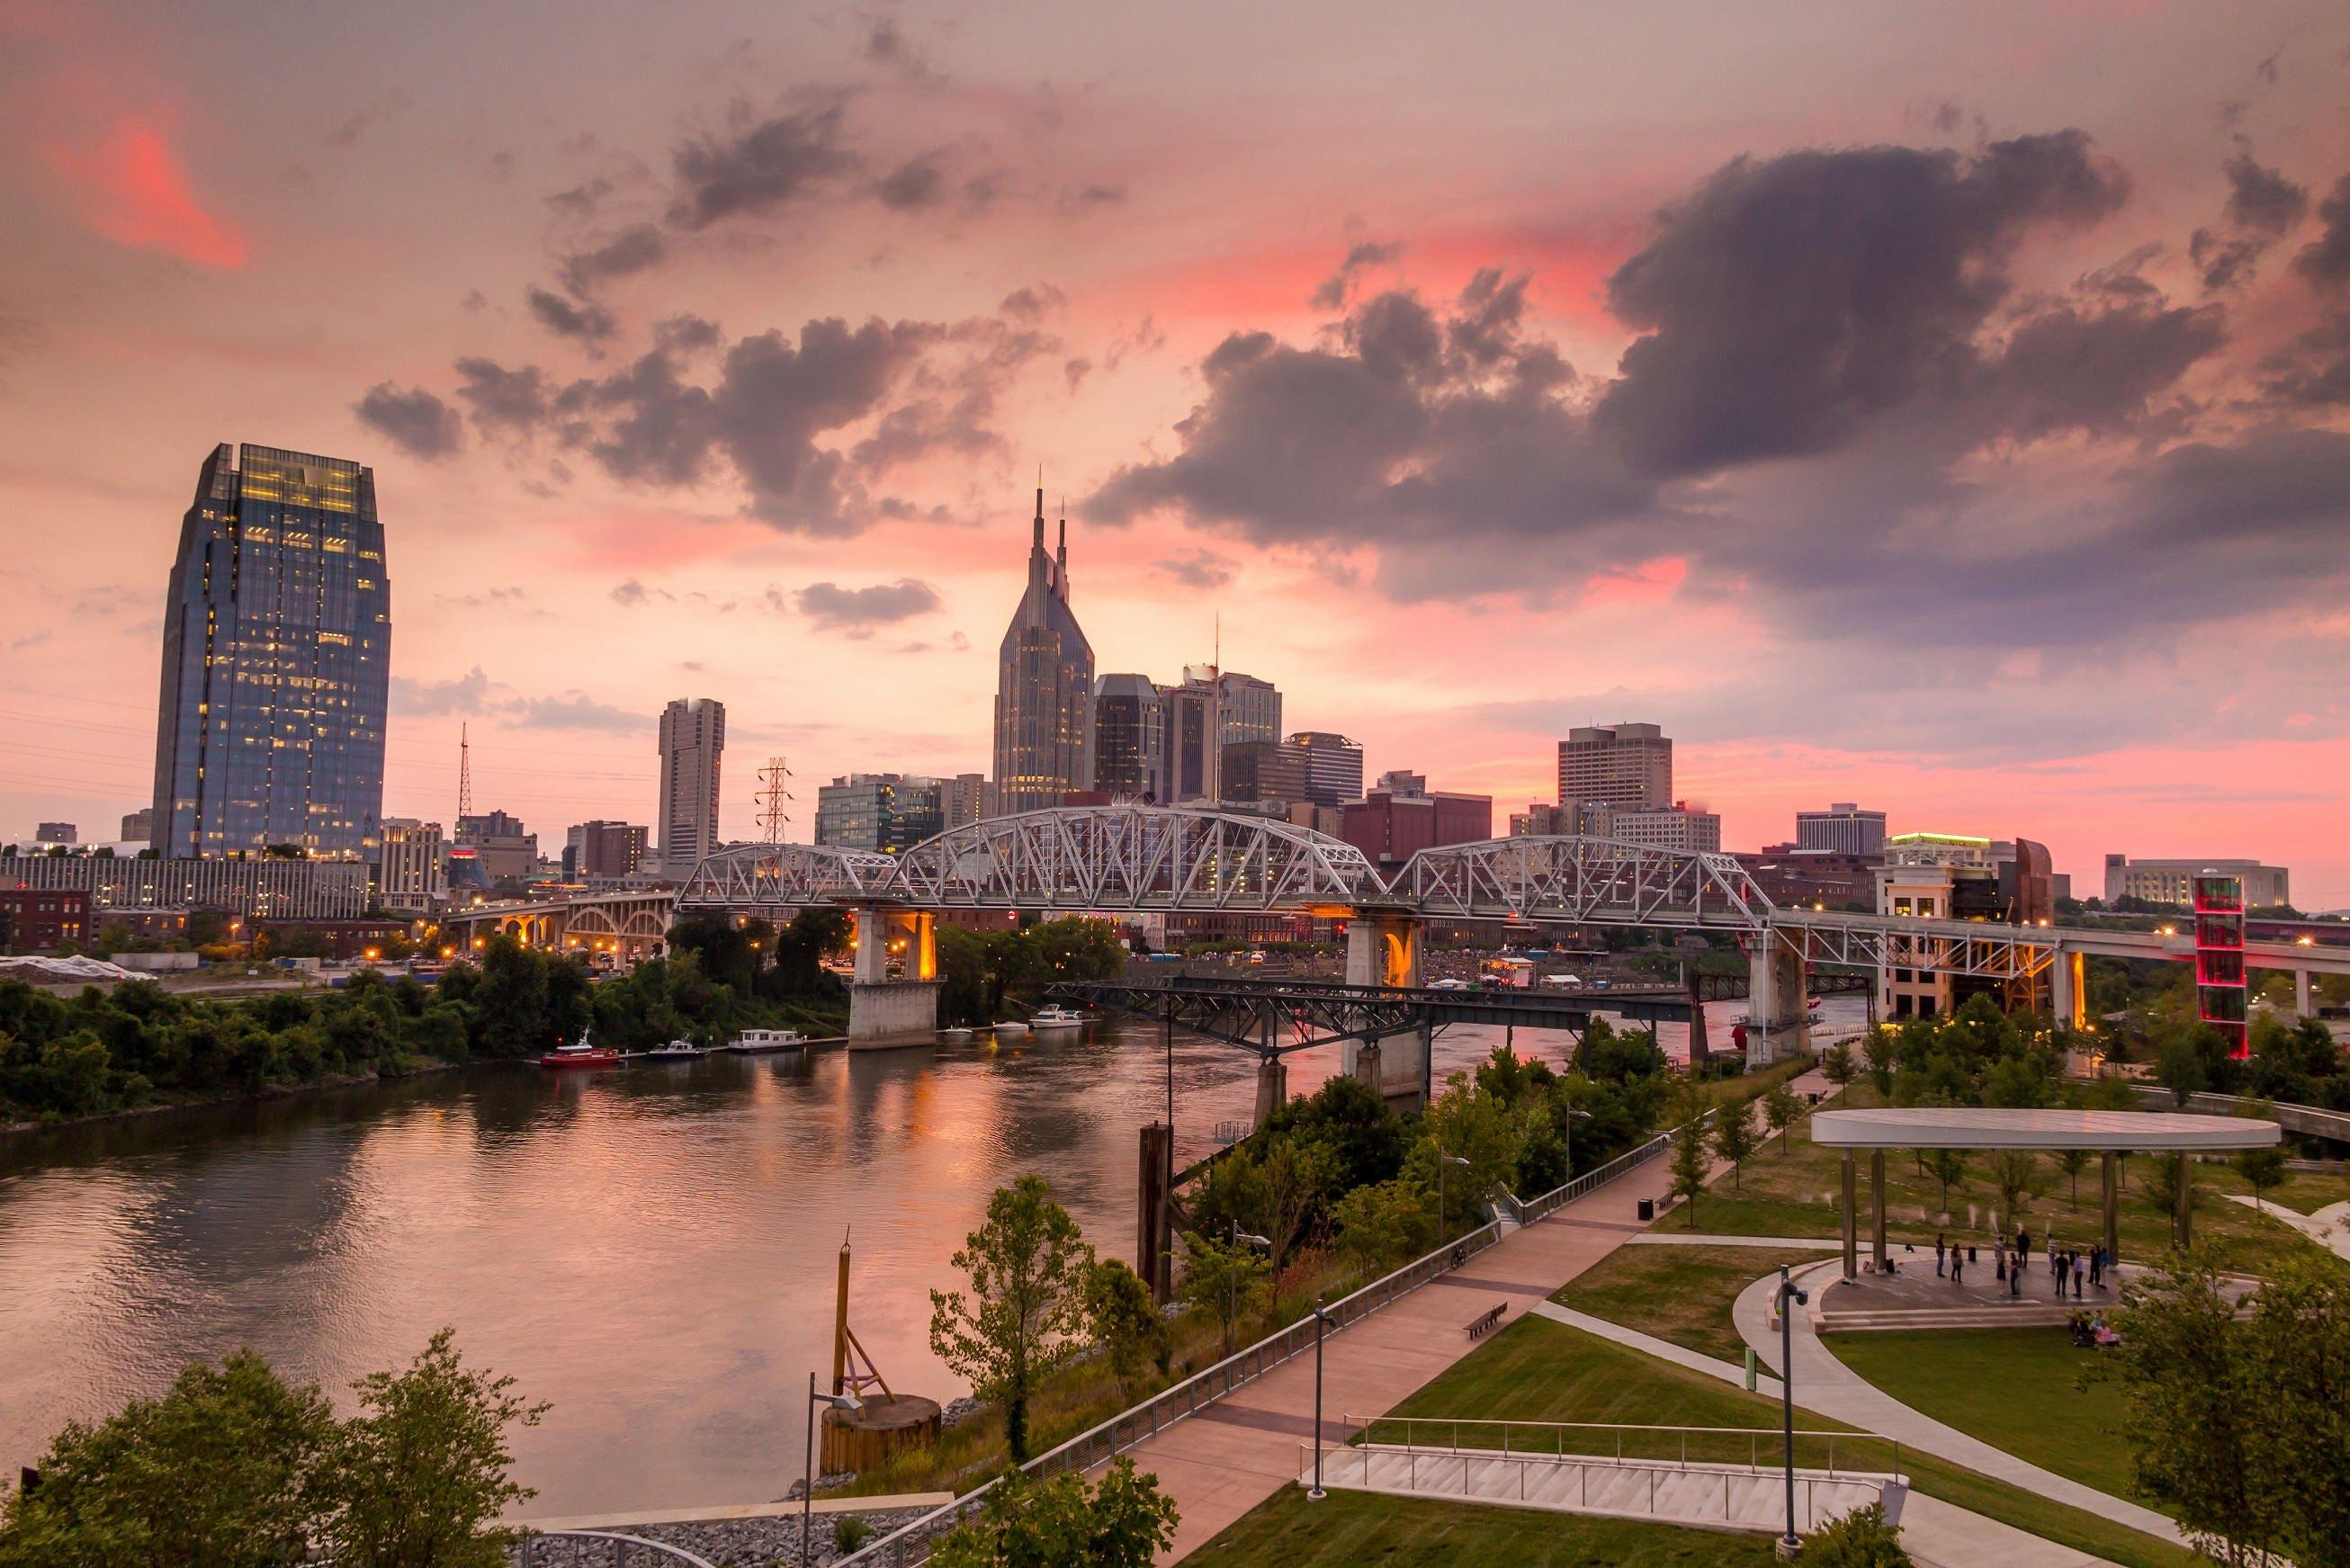 Nashville skyline canvas Nashville Canvas Nashville skyline Nashville wall canvas Nashville TN Nashville wall art Nashville photo & Nashville skyline canvas Nashville Canvas Nashville skyline ...